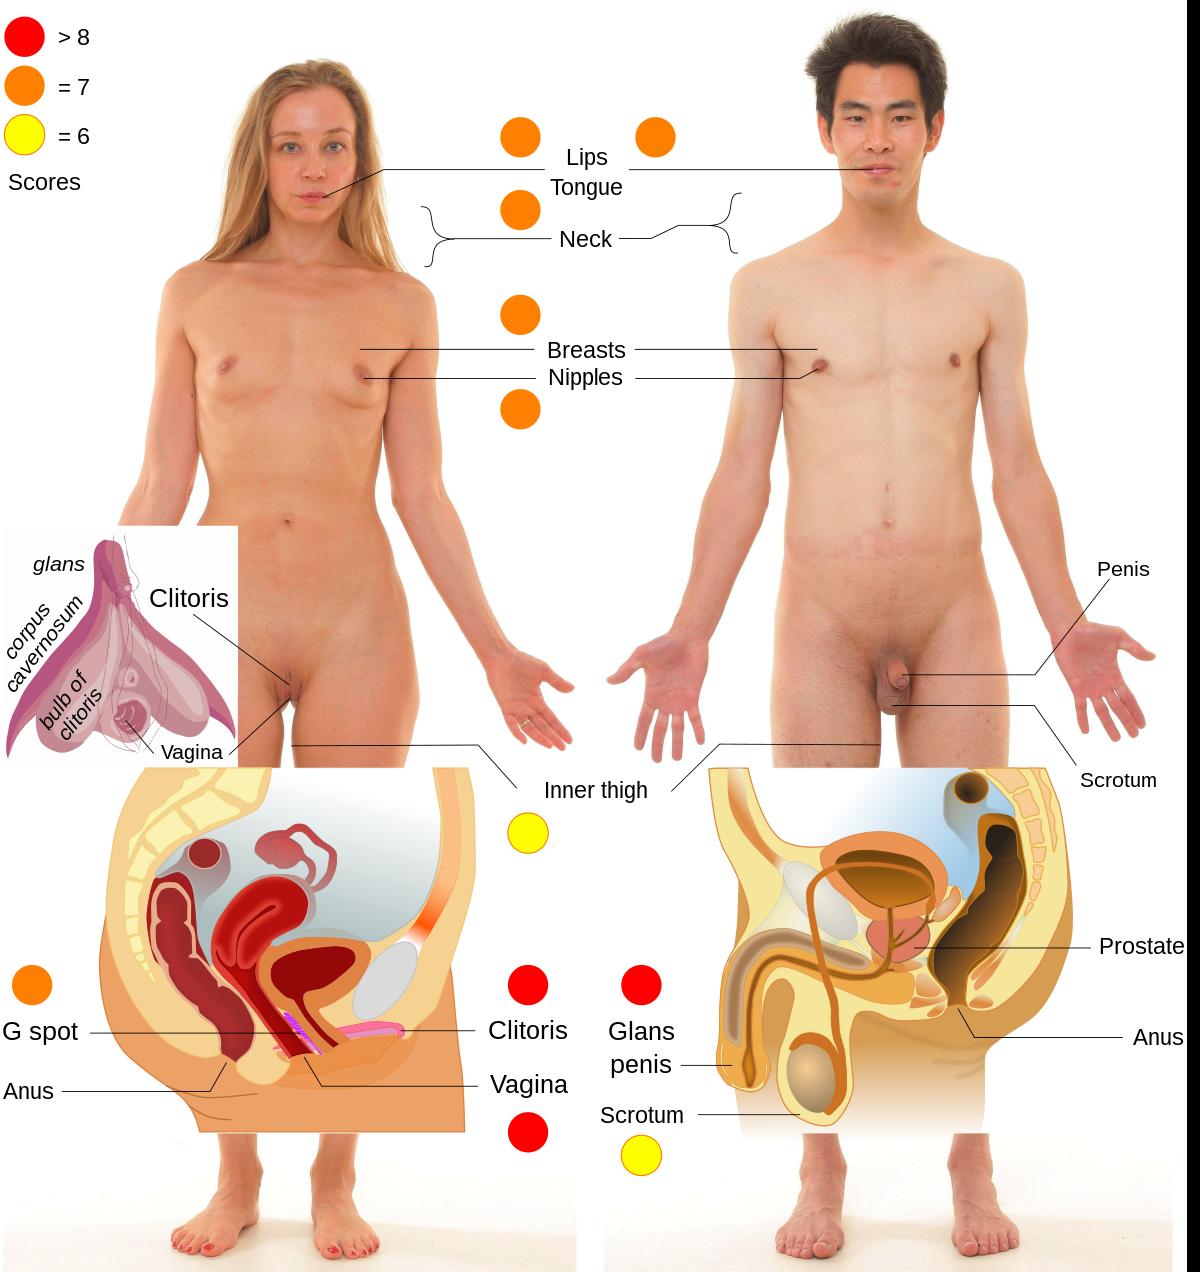 30 erogén zóna a férfi testen